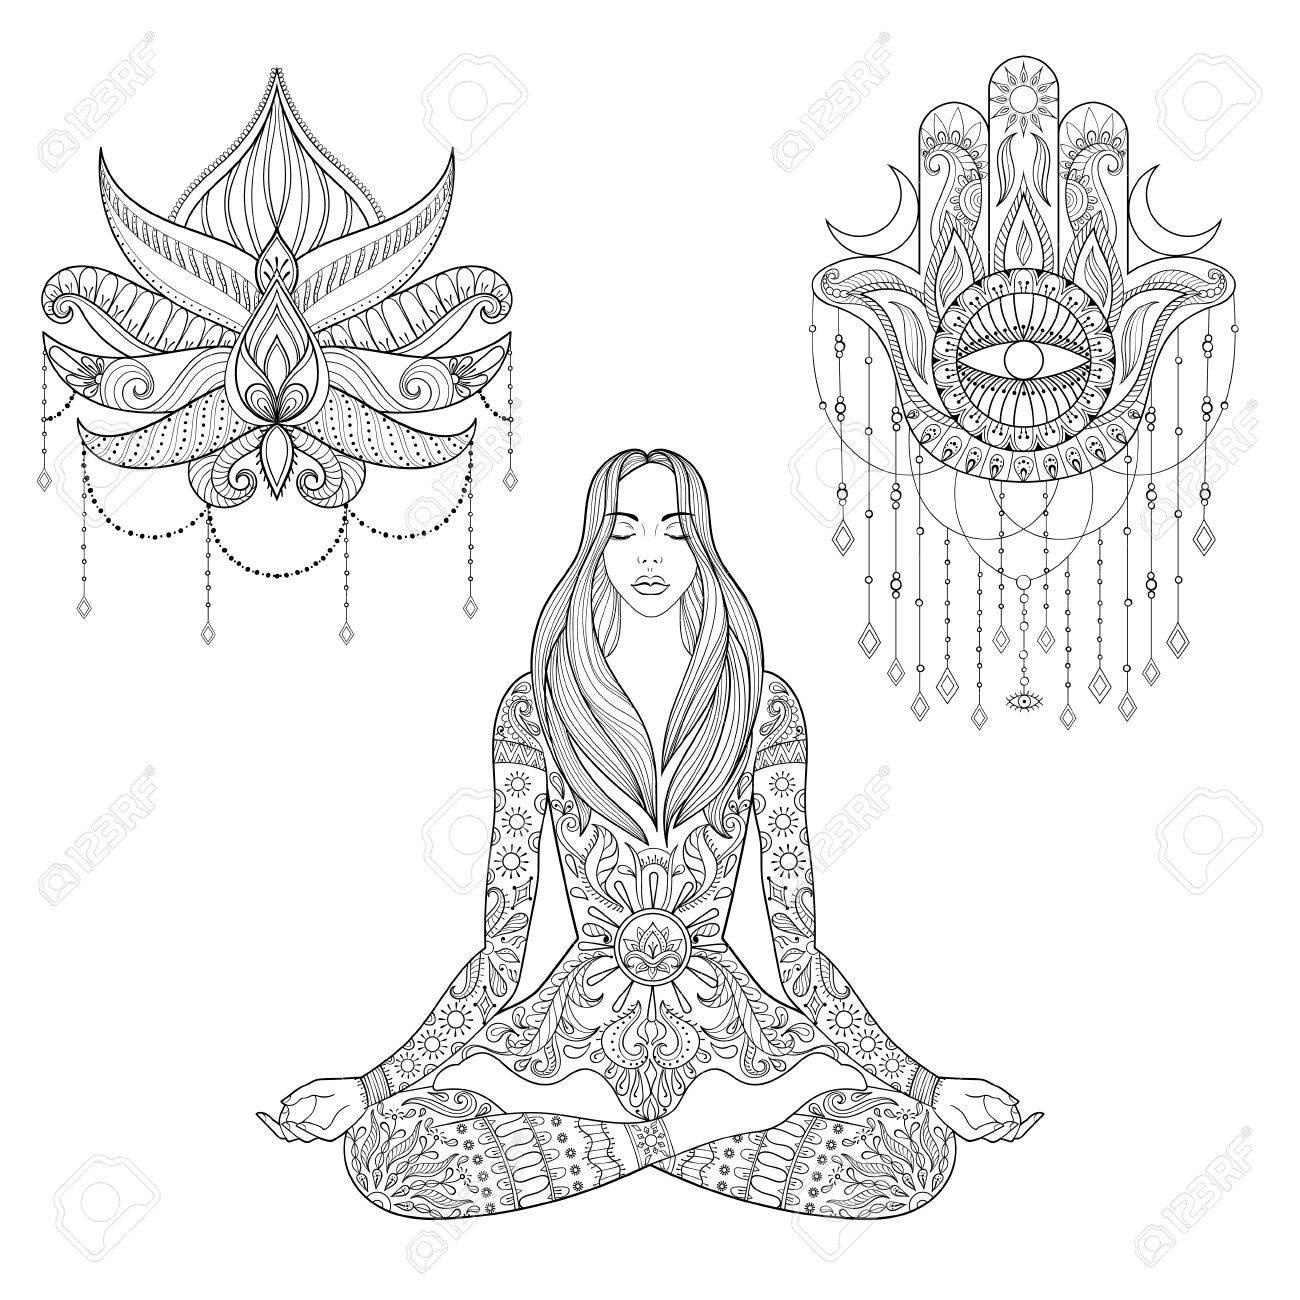 Woman sitting in lotus position hamsa hand flower tattoo design woman sitting in lotus position hamsa hand flower tattoo design stock vector izmirmasajfo Gallery